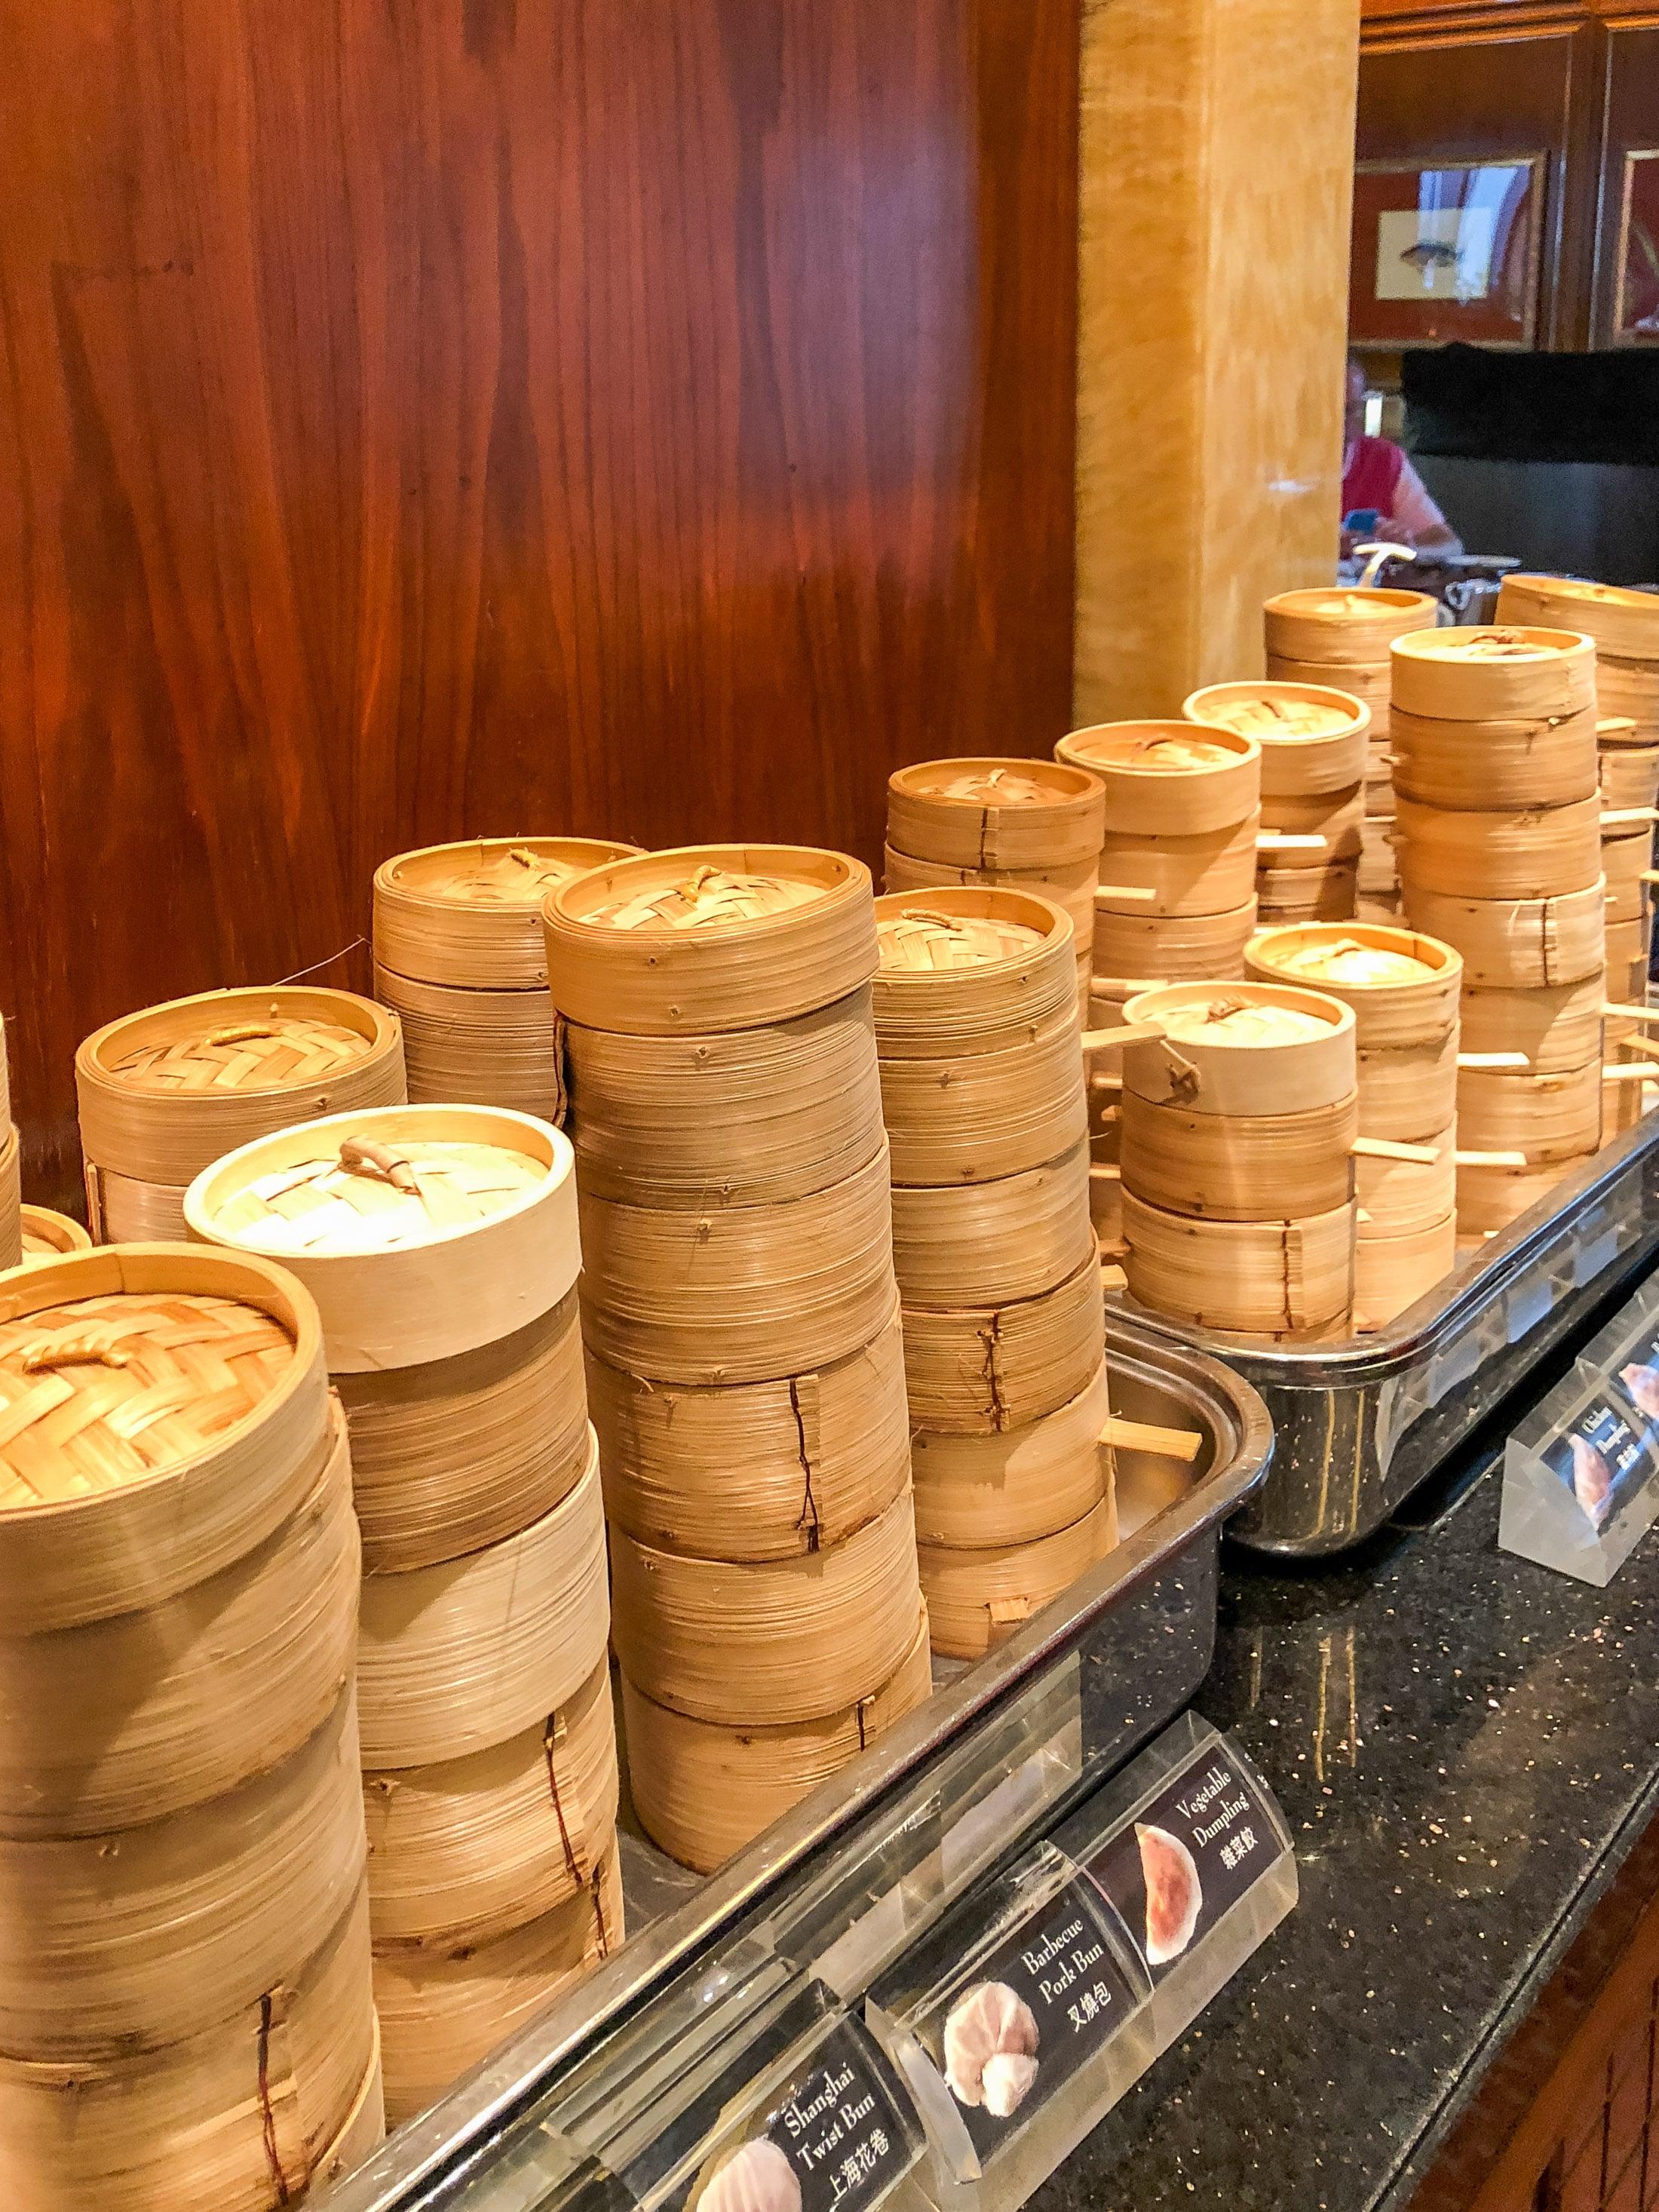 dim sum for breakfast in Hong Kong